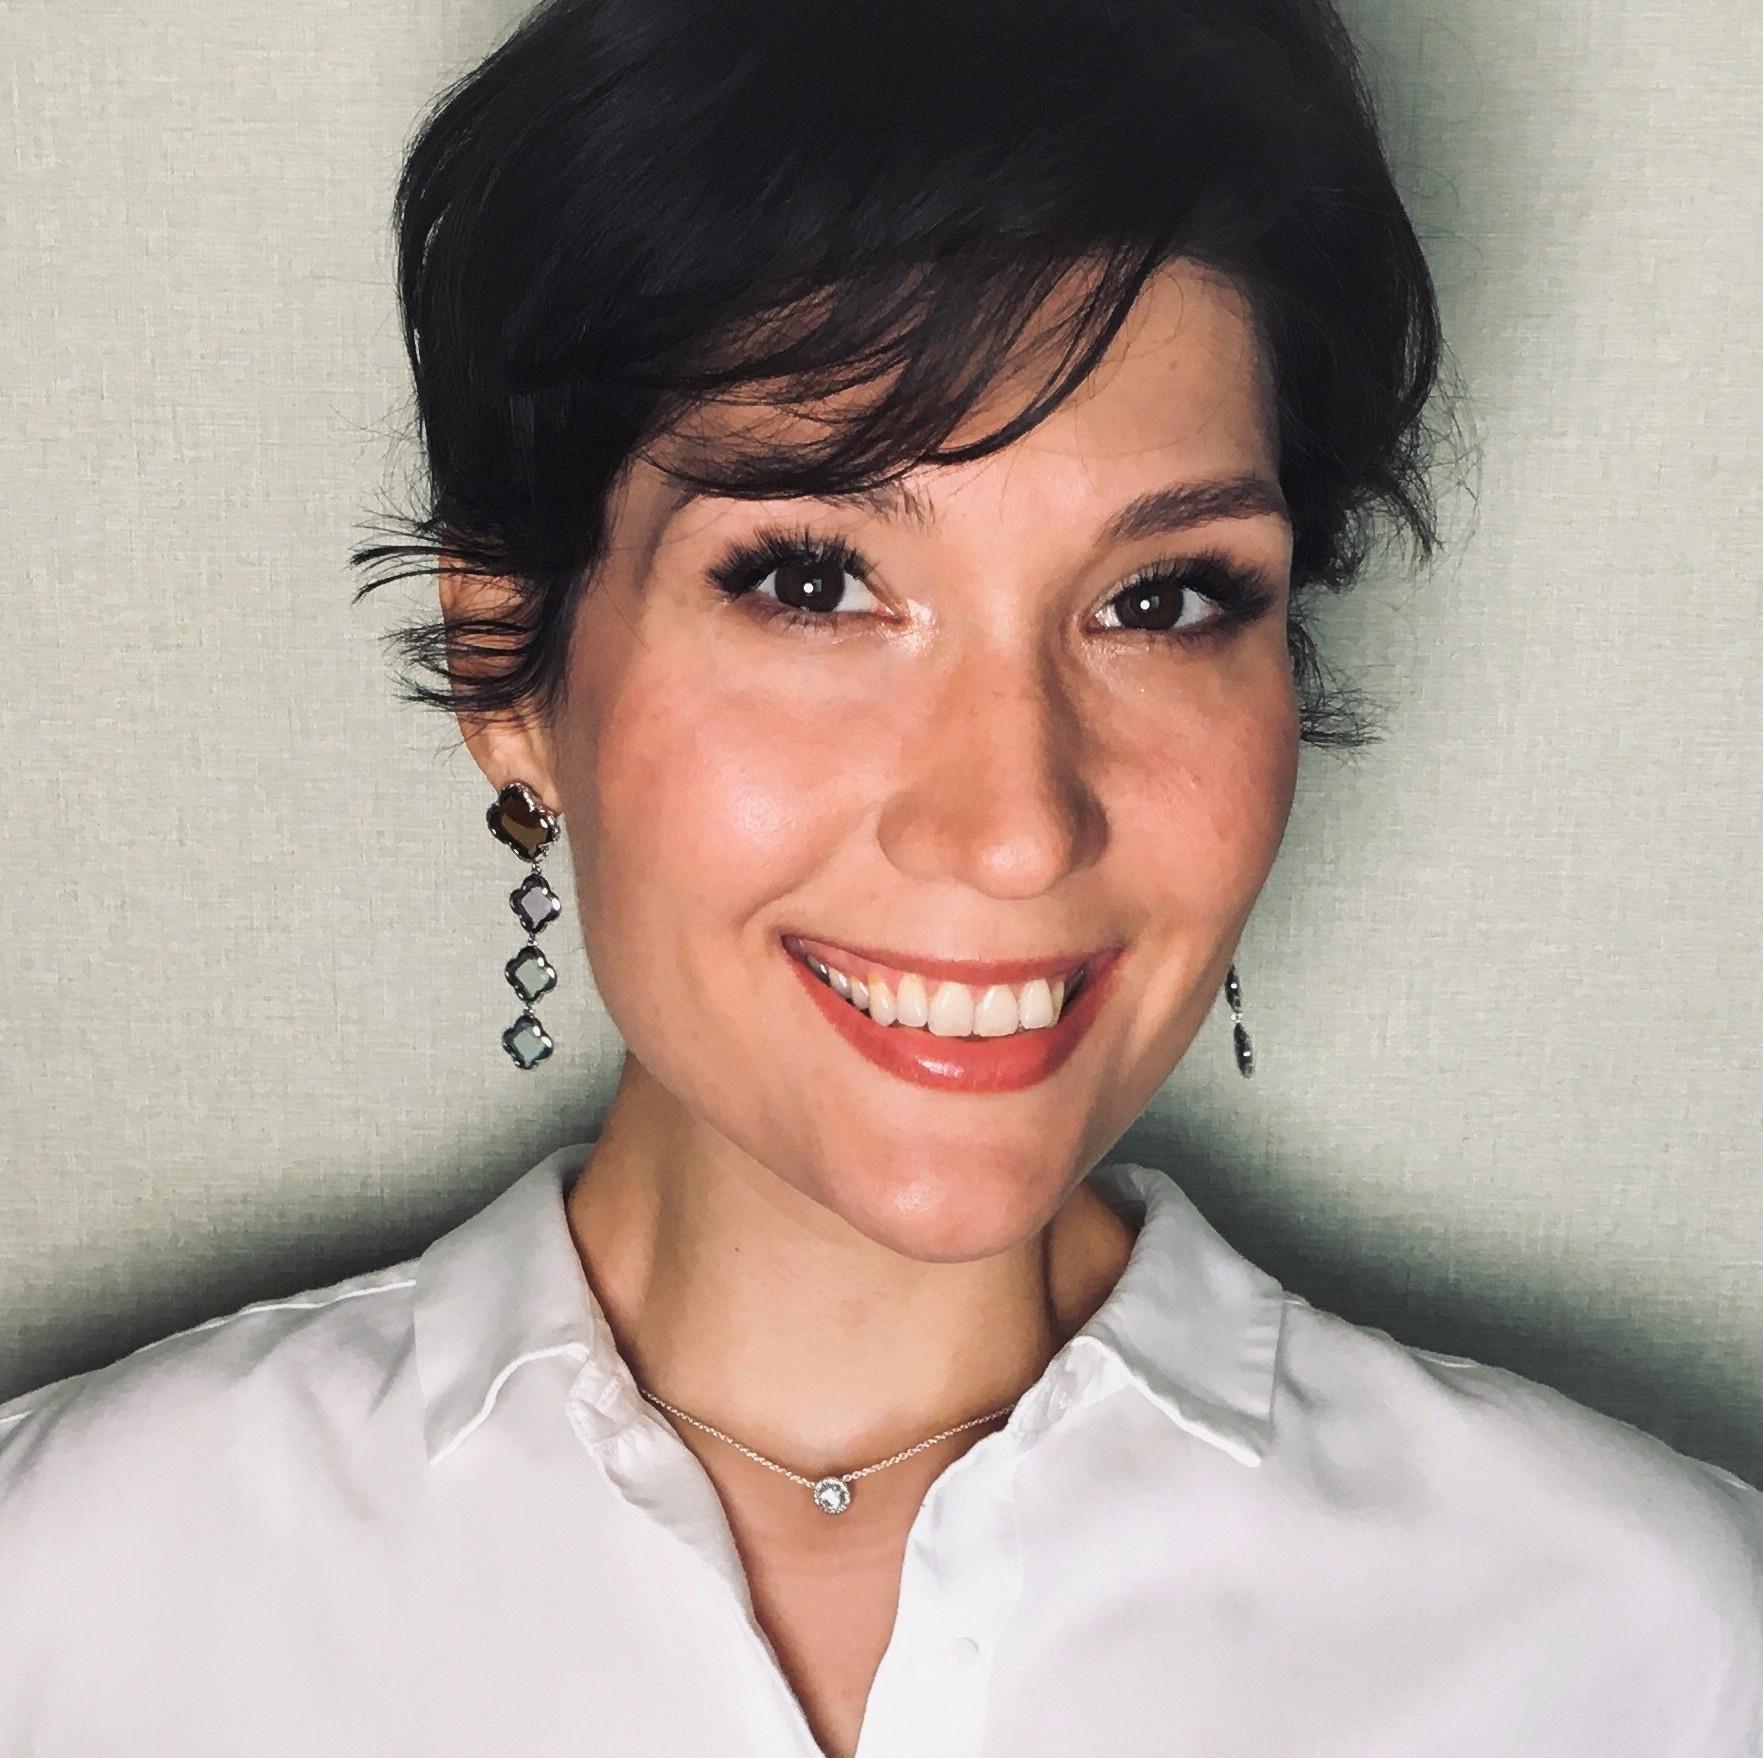 Lana Zurabova